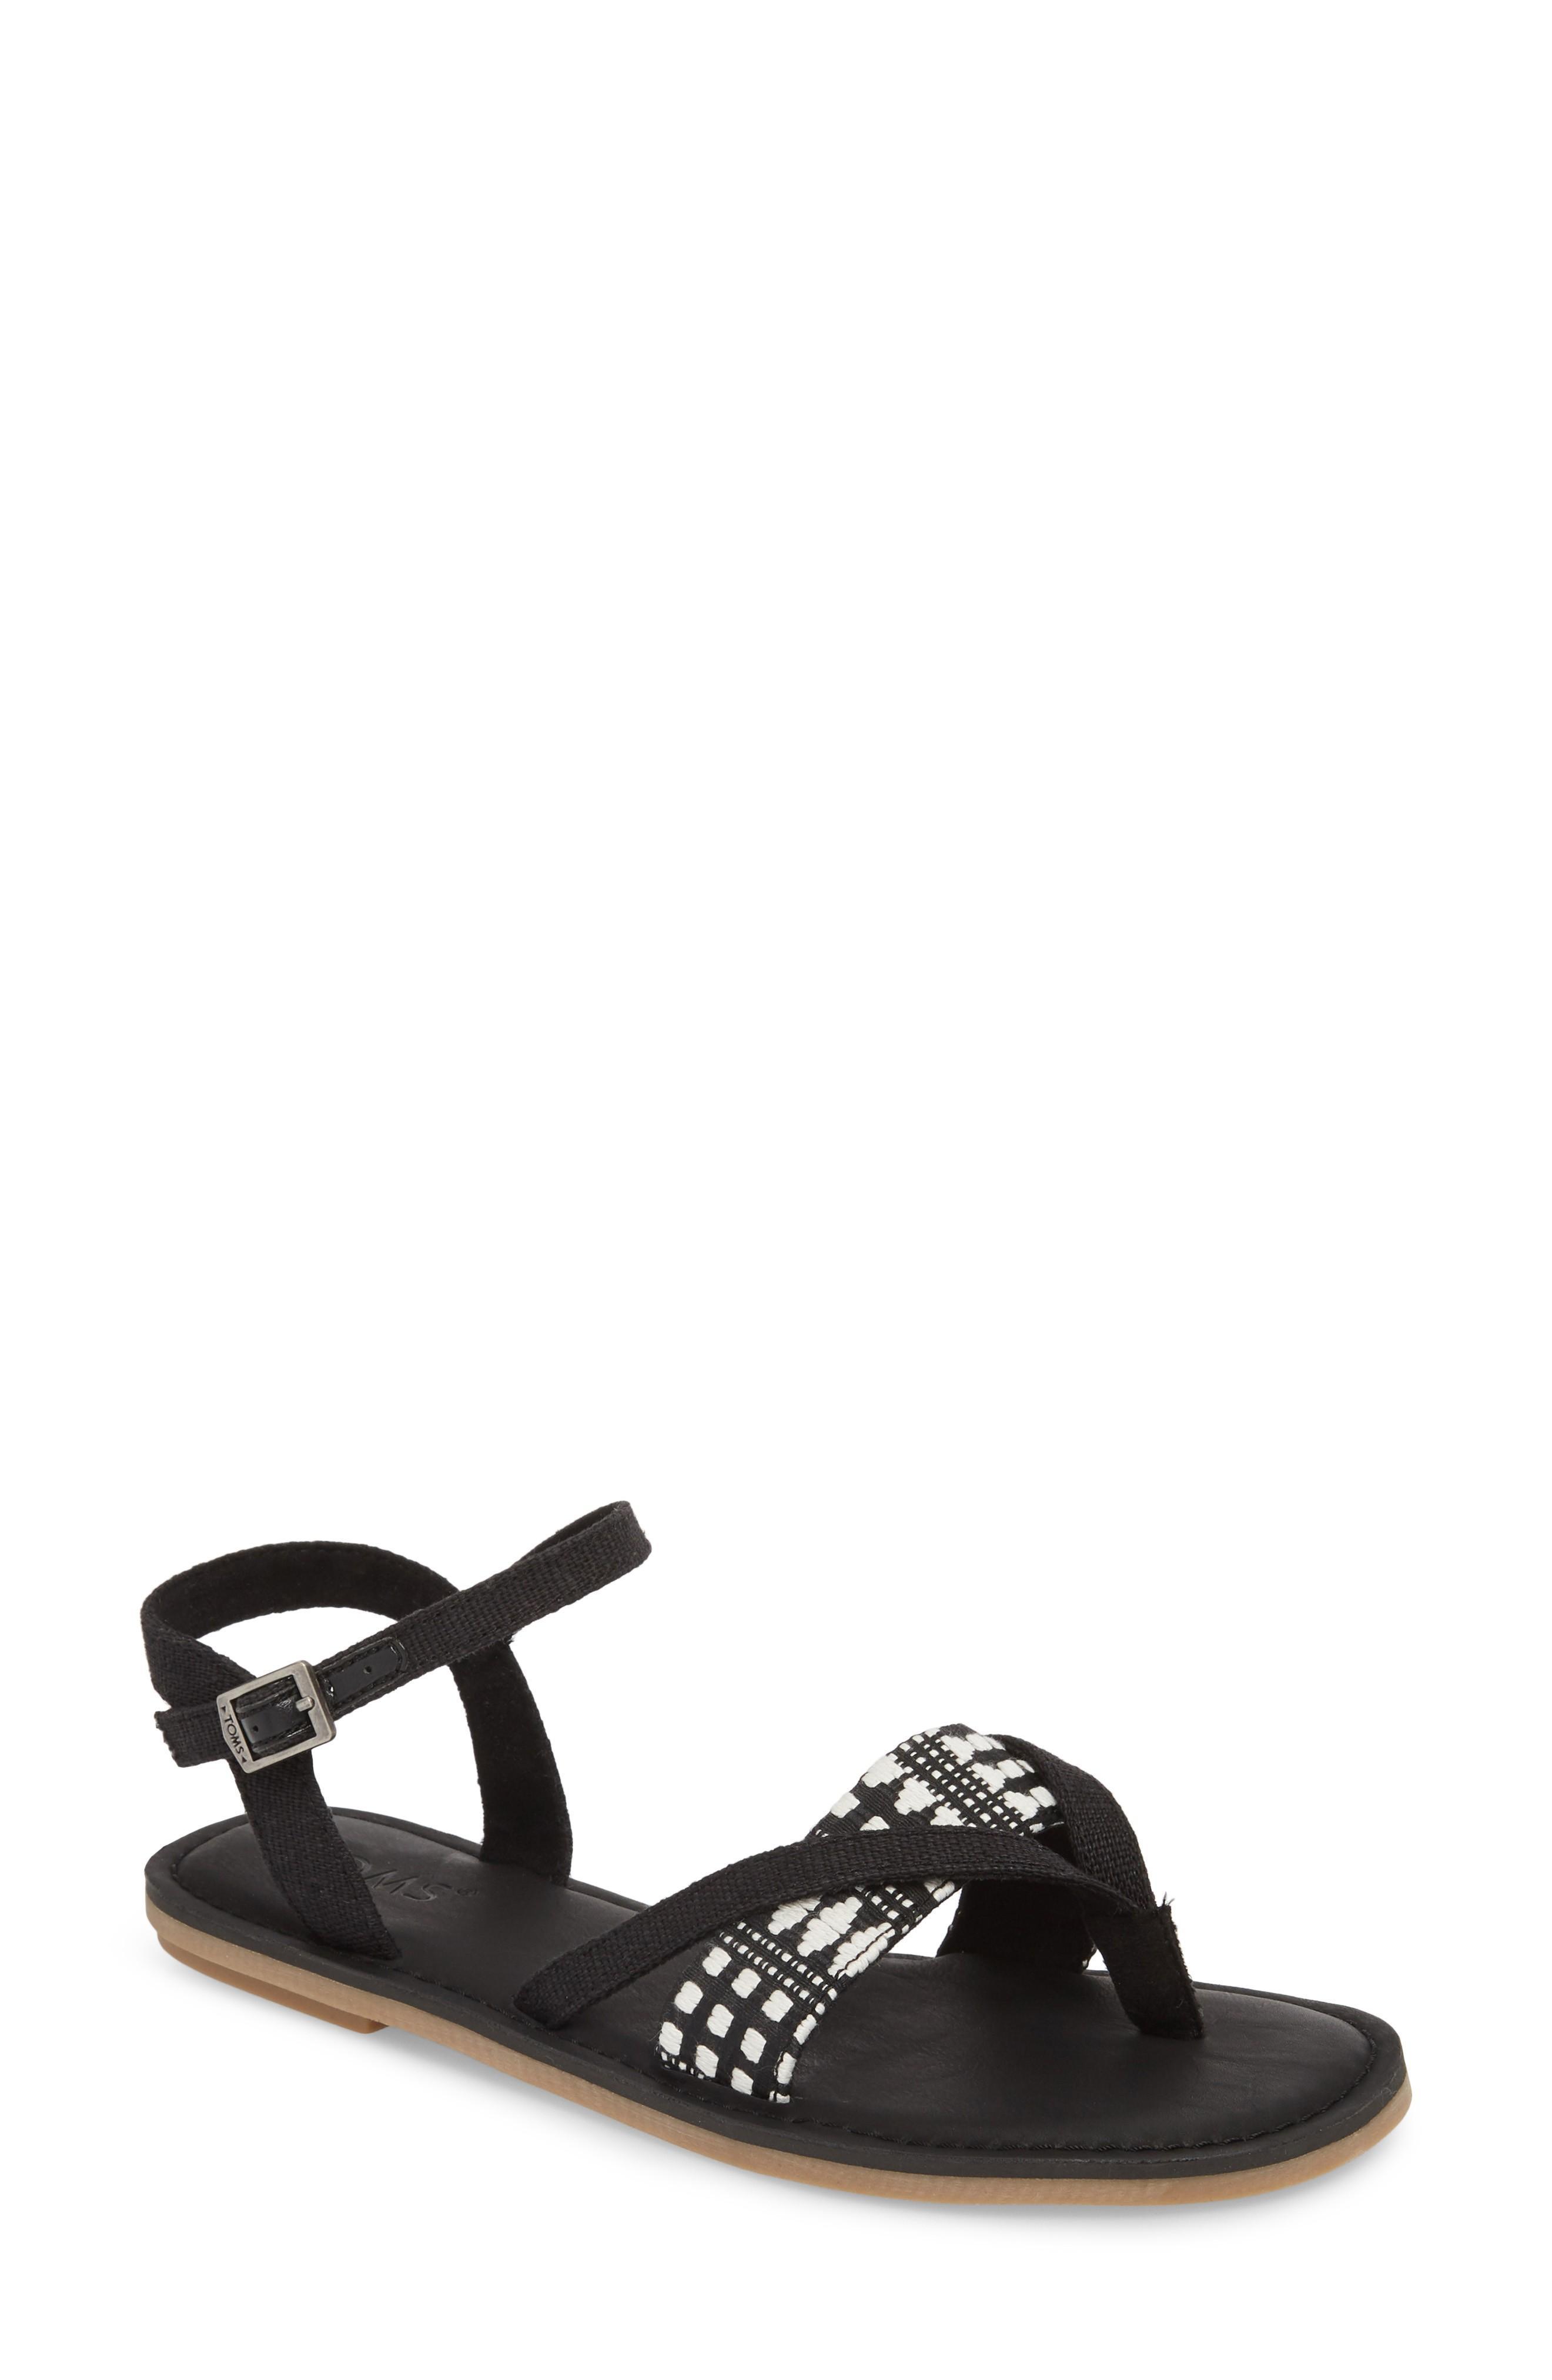 53c3a5a5e45 Toms  Lexie  Sandal In Black Canvas  Diamond Tribal